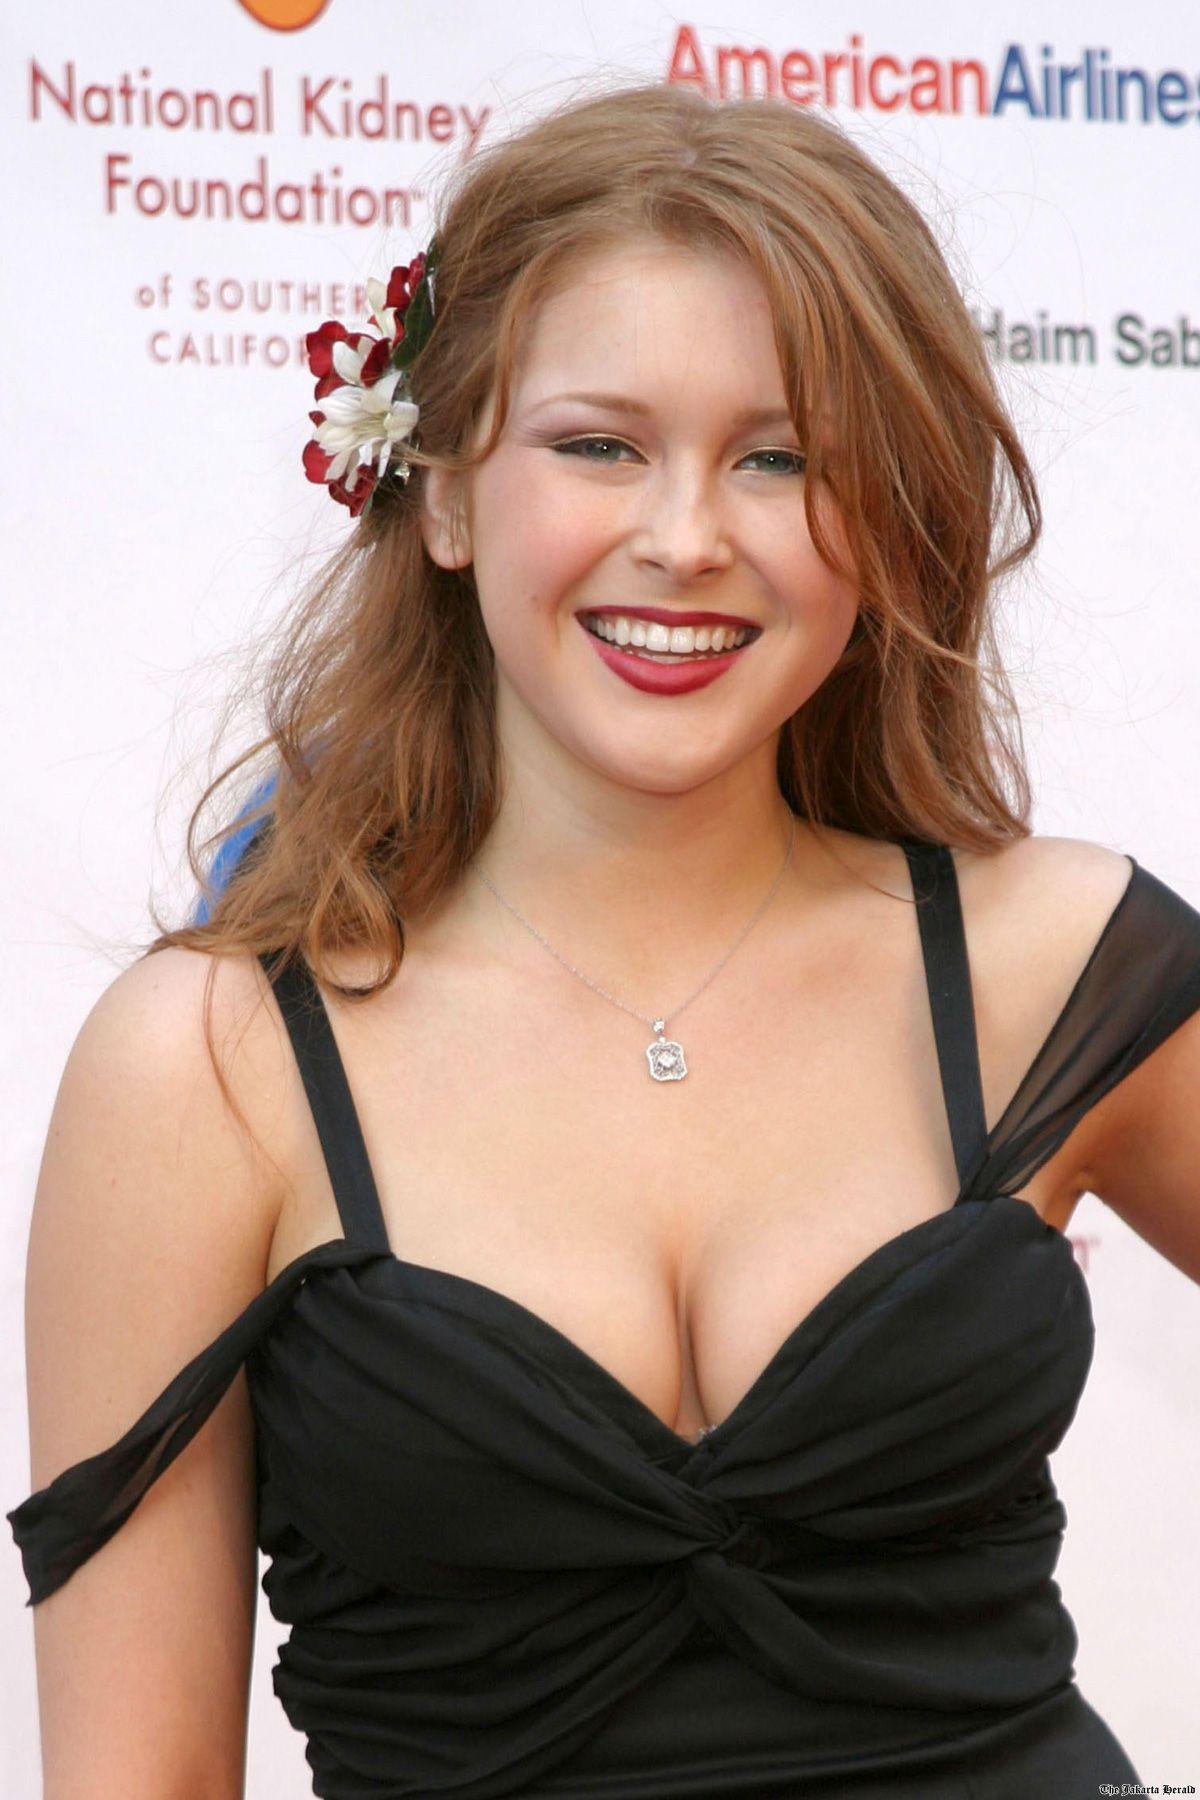 Renee olstead hot naked (29 photos), Cleavage Celebrity image